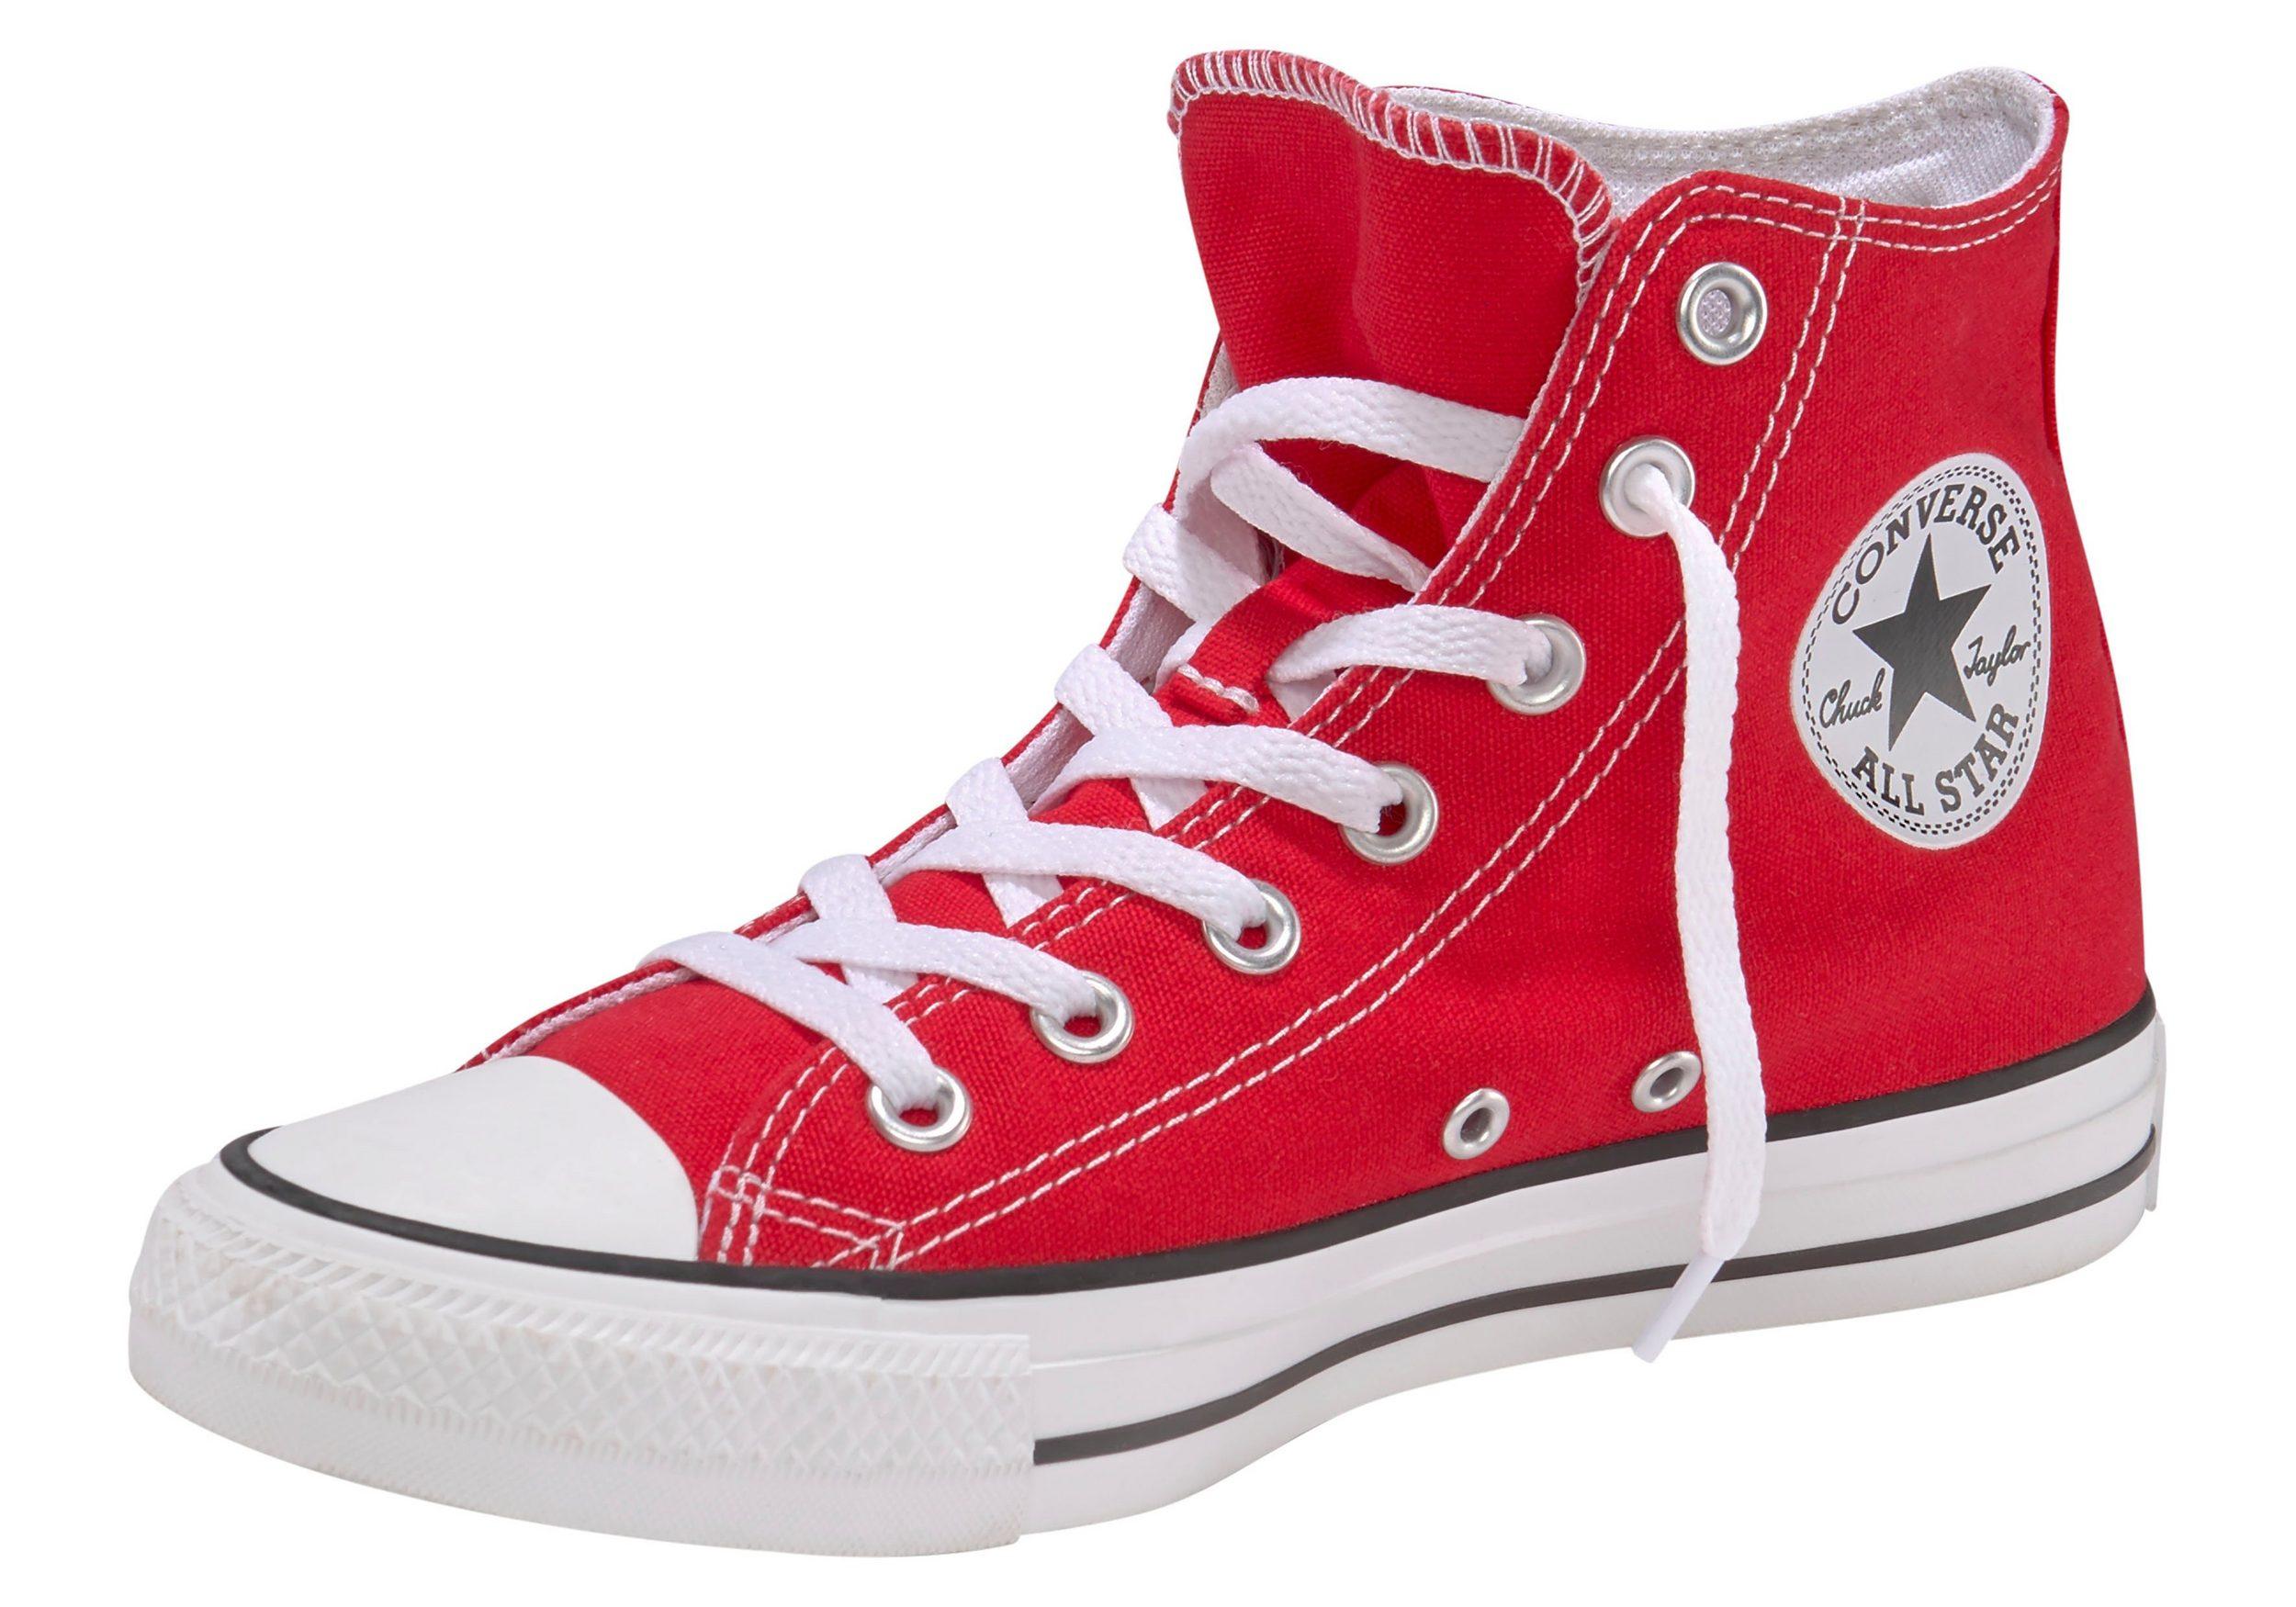 Converse Chuck Taylor All Star Pocket Hi Sneaker (Größen 36 bis 46)